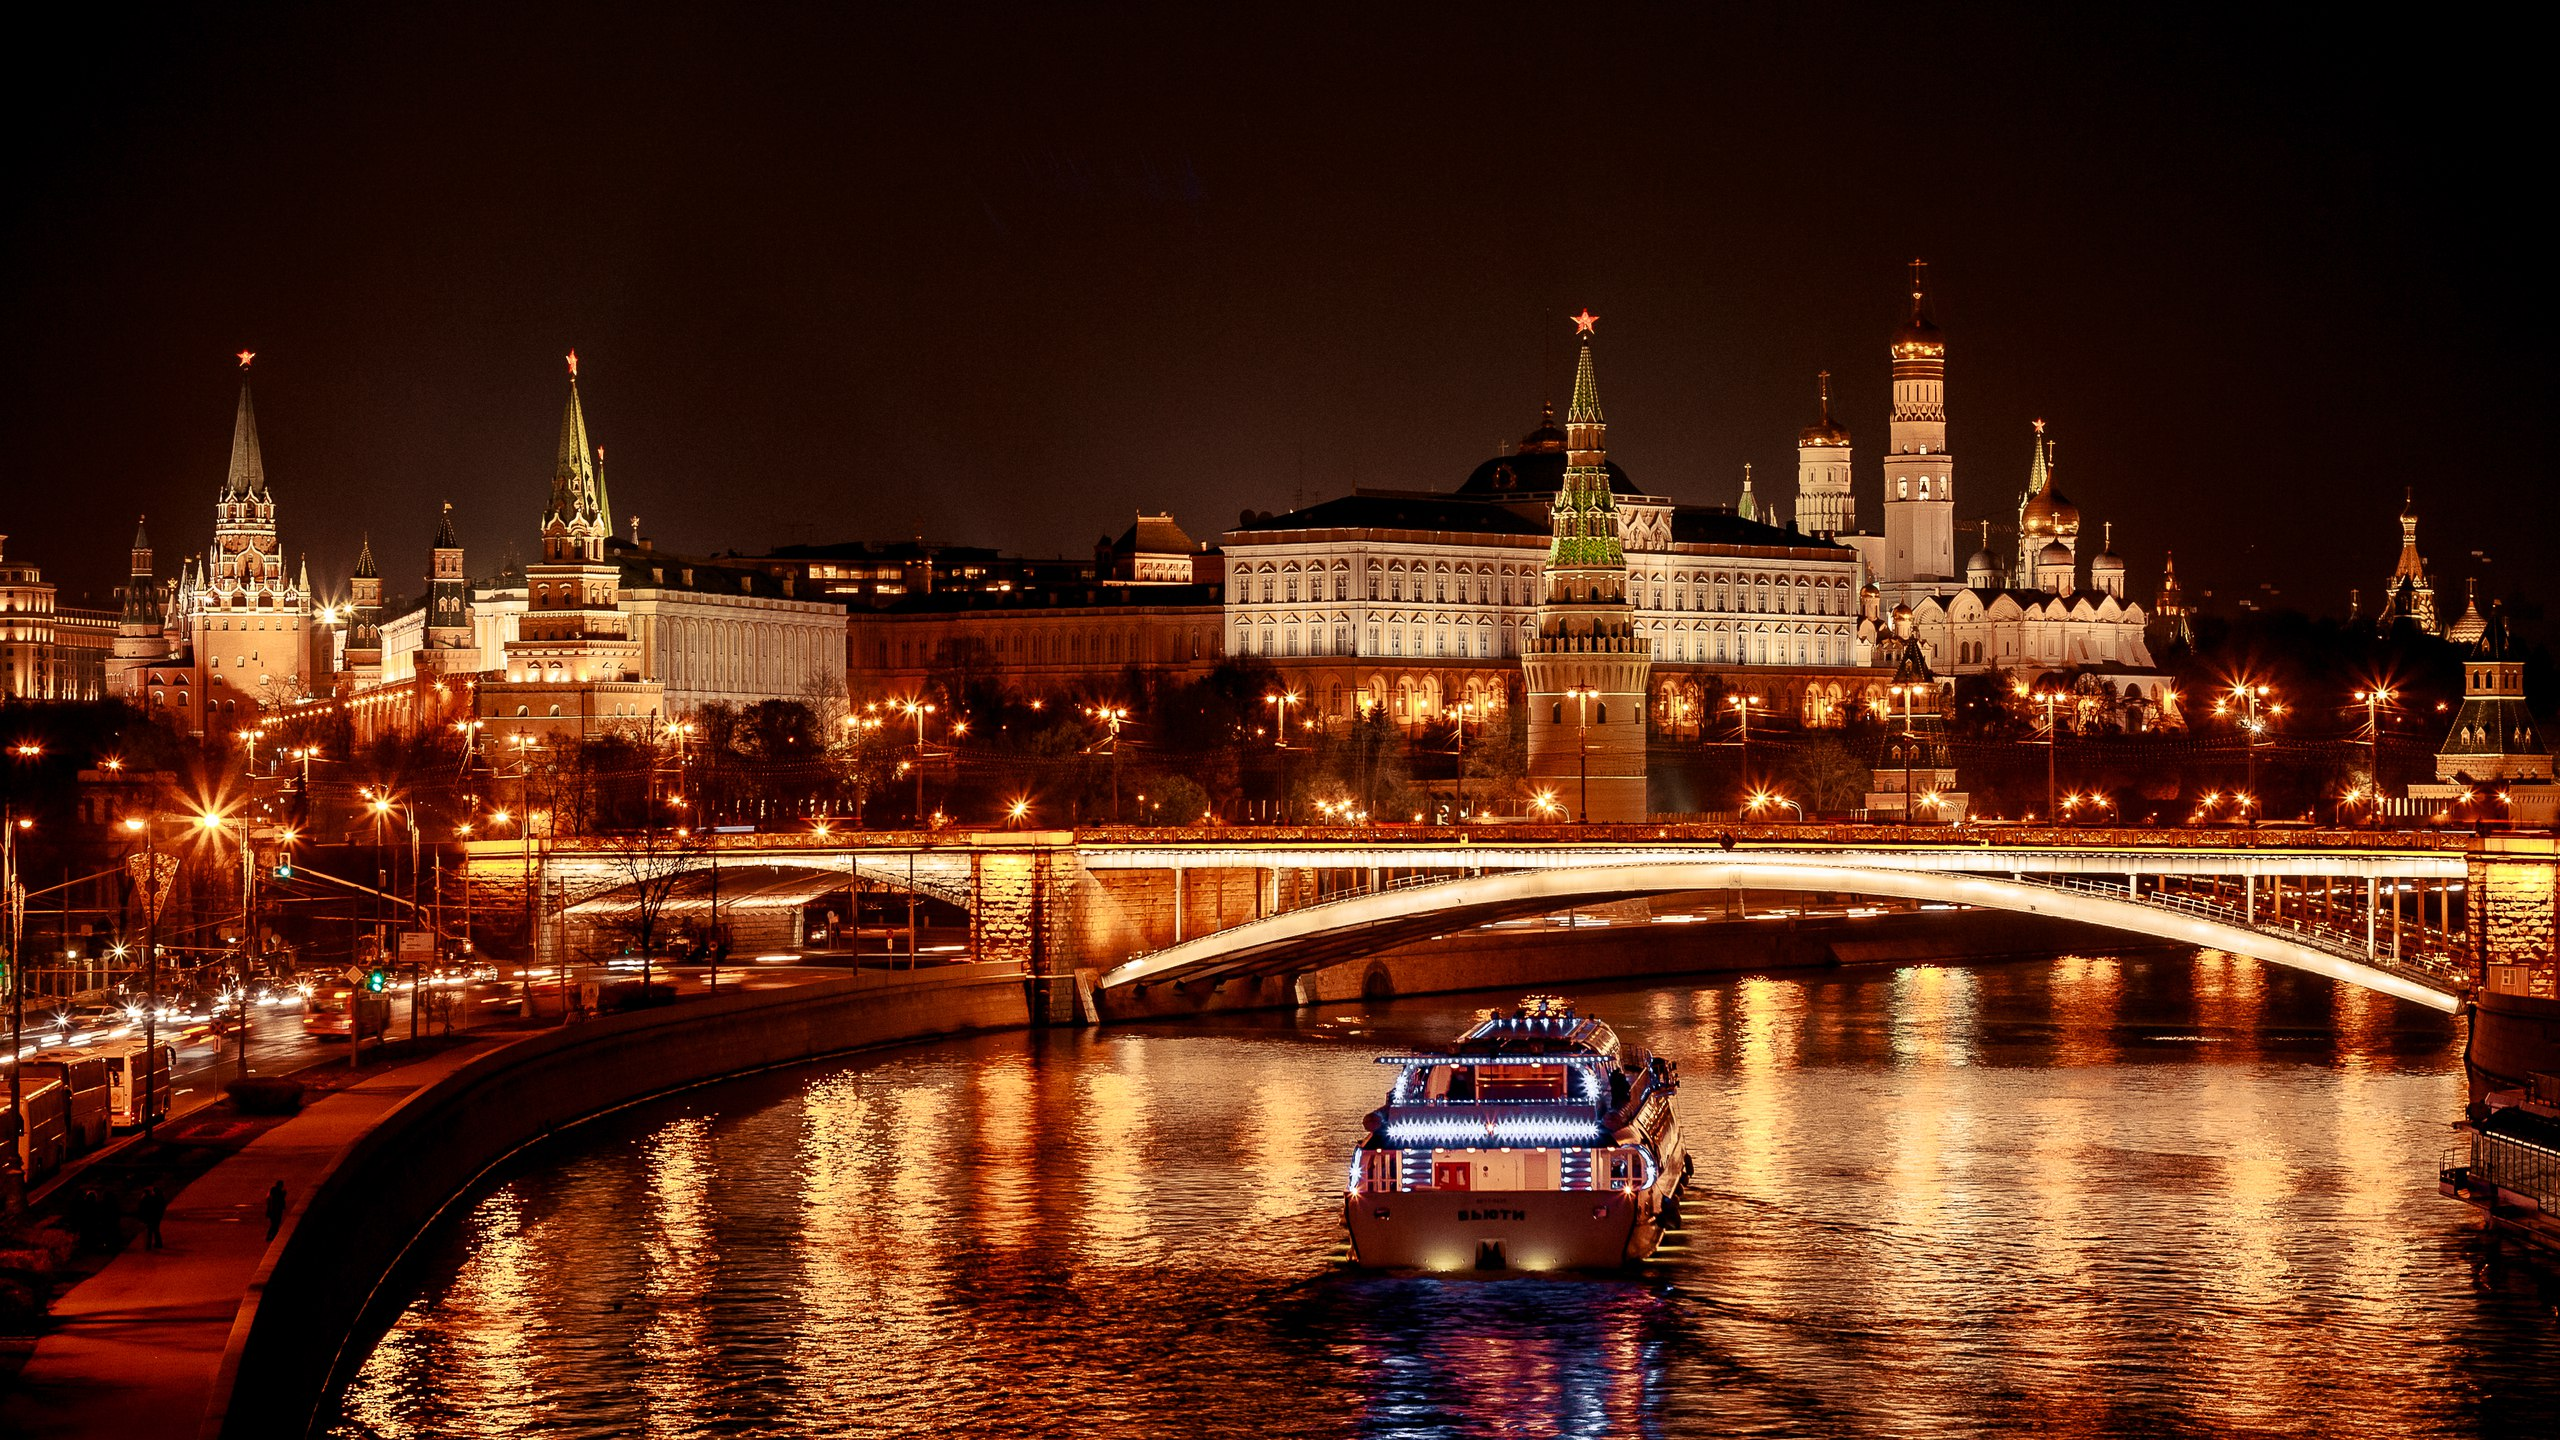 Ночная москва фото 1 фотография